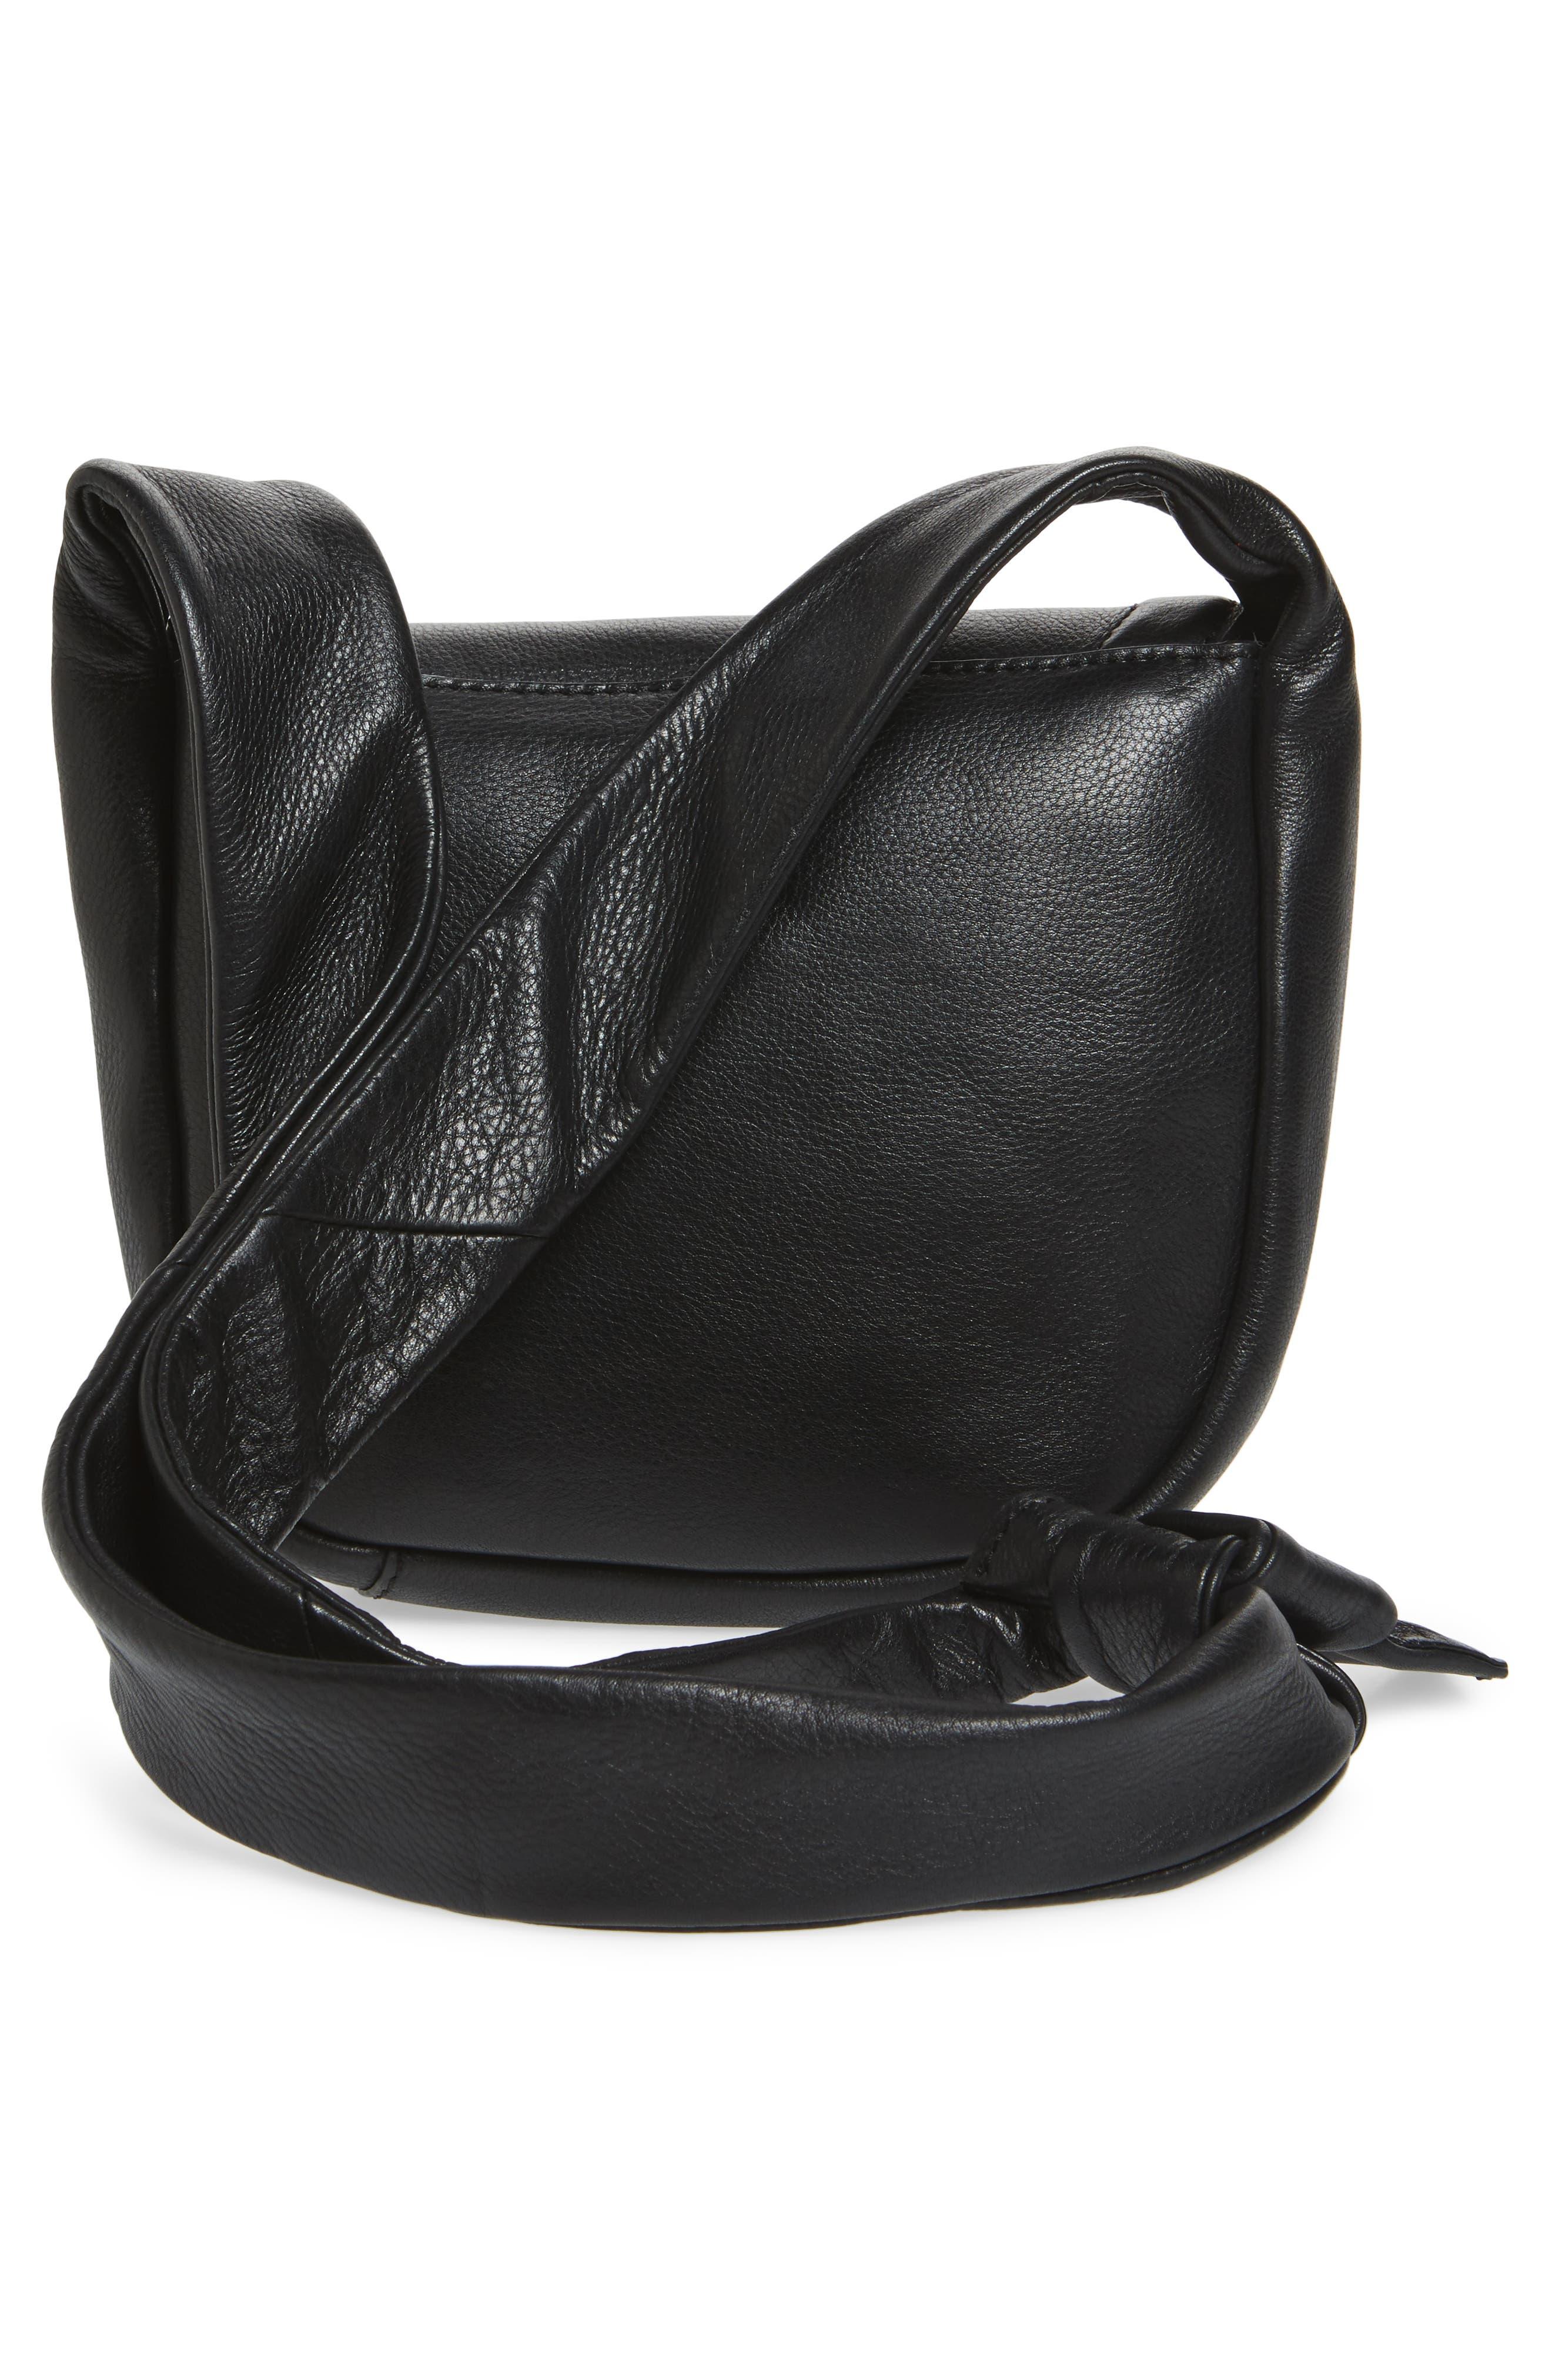 Jasmine Leather Saddle Bag,                             Alternate thumbnail 3, color,                             Black